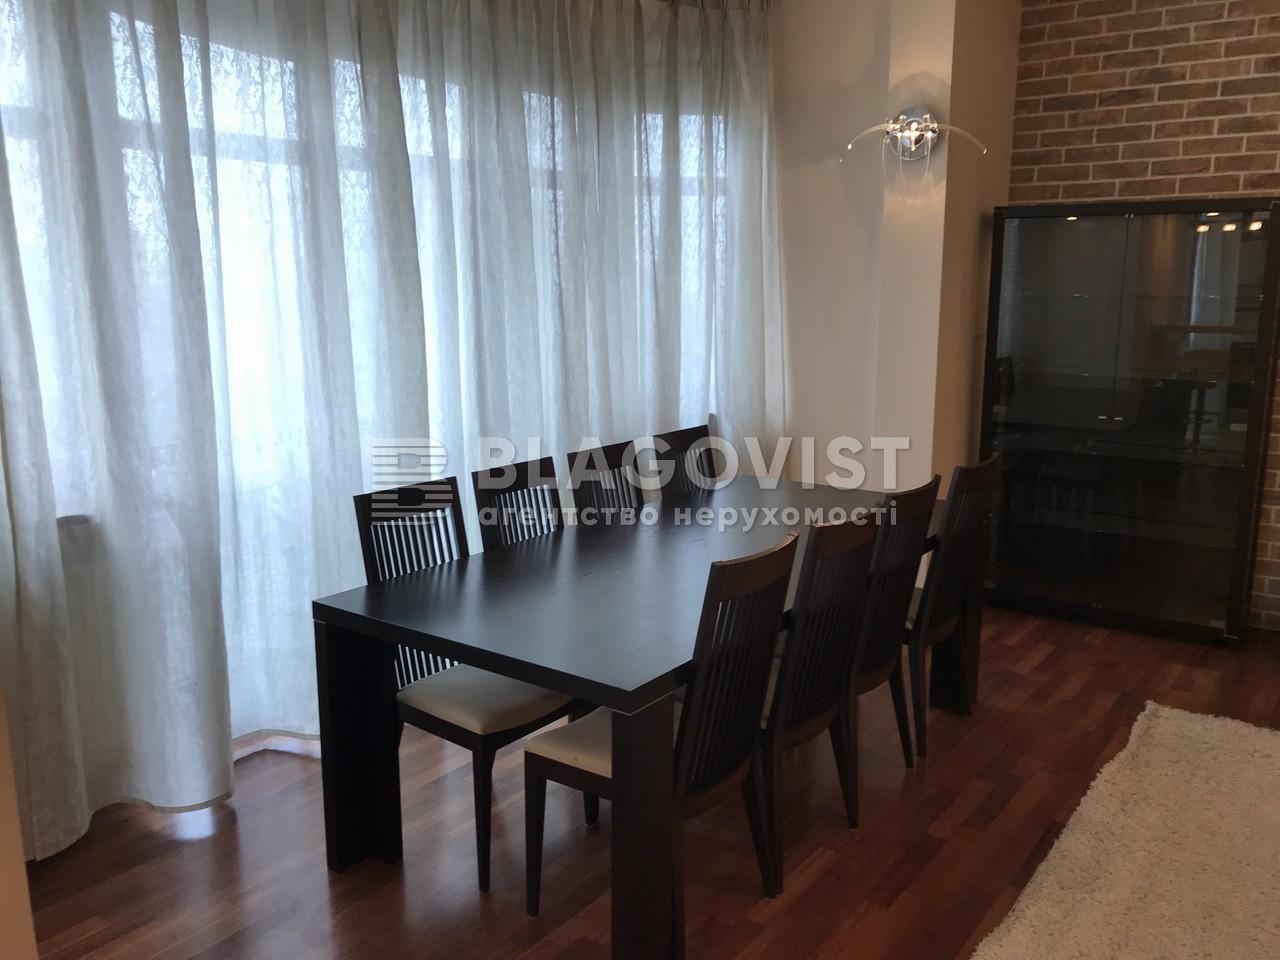 Квартира A-73479, Коновальца Евгения (Щорса), 32а, Киев - Фото 13